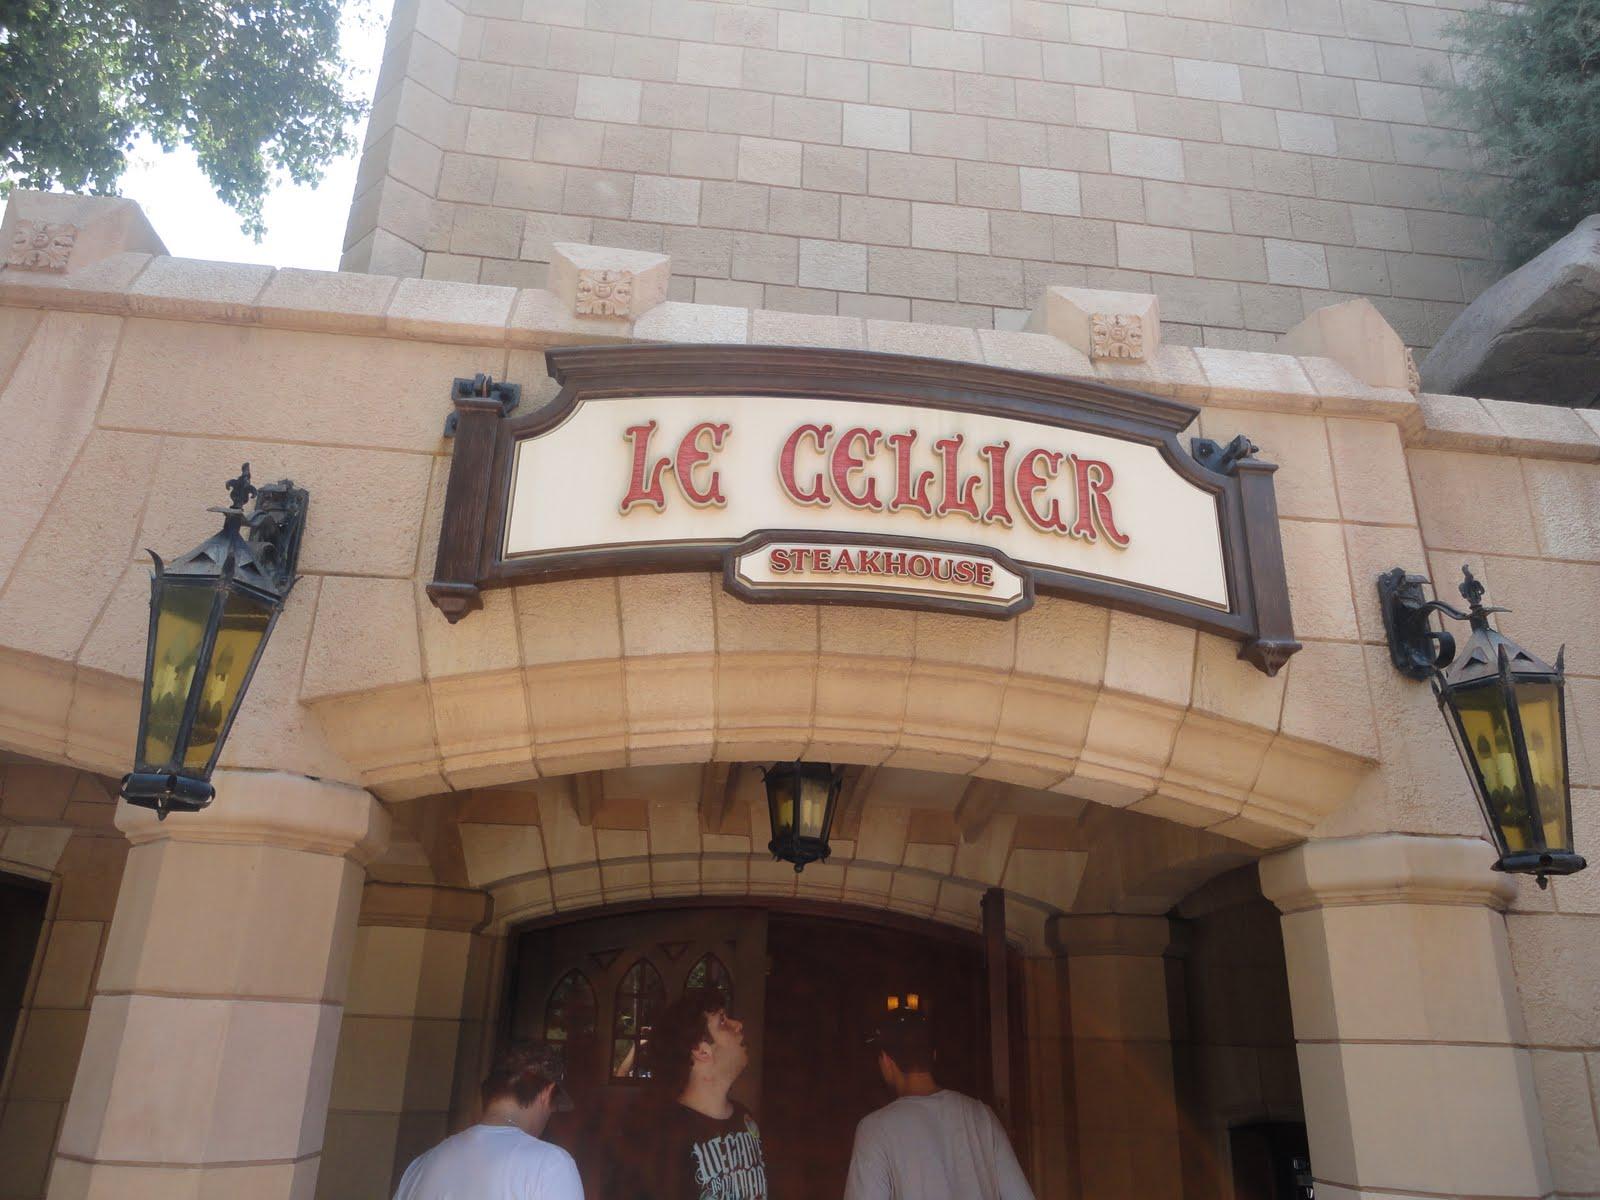 The florida dine and dash le cellier justifable cuisine legend - Cellier cuisine ...